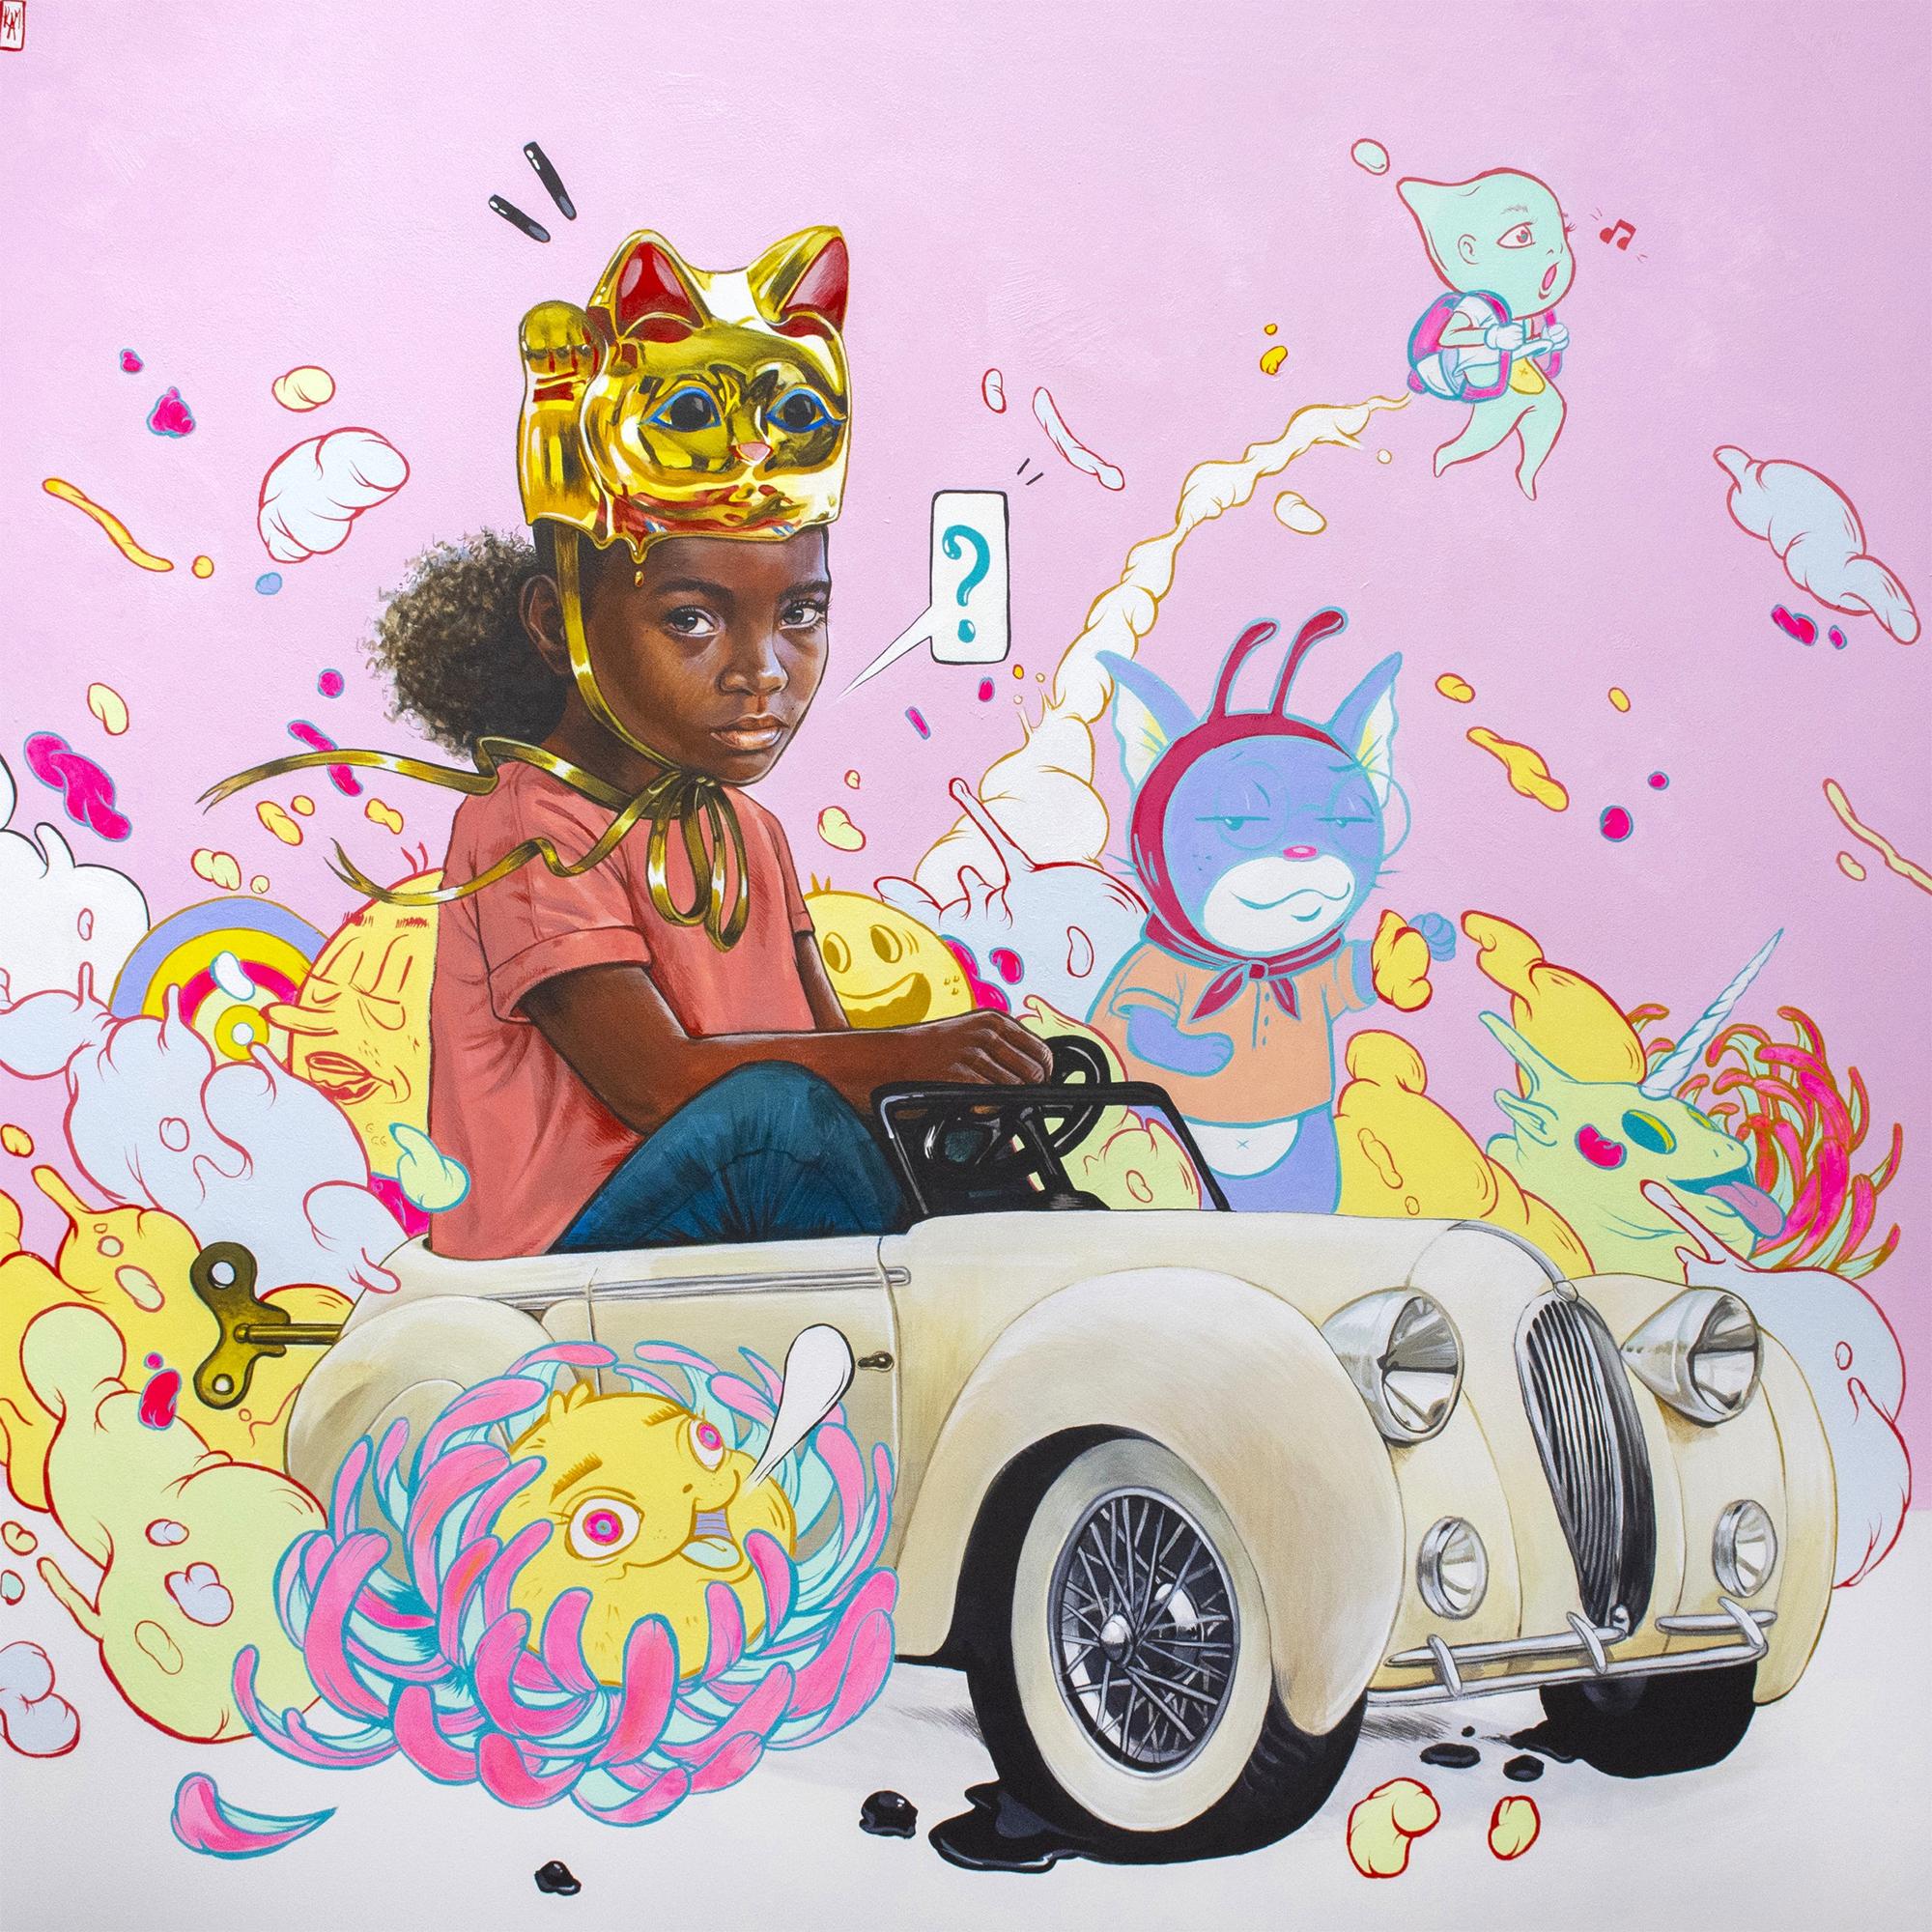 Children's fantasies in paintings by Kayla Mahaffey